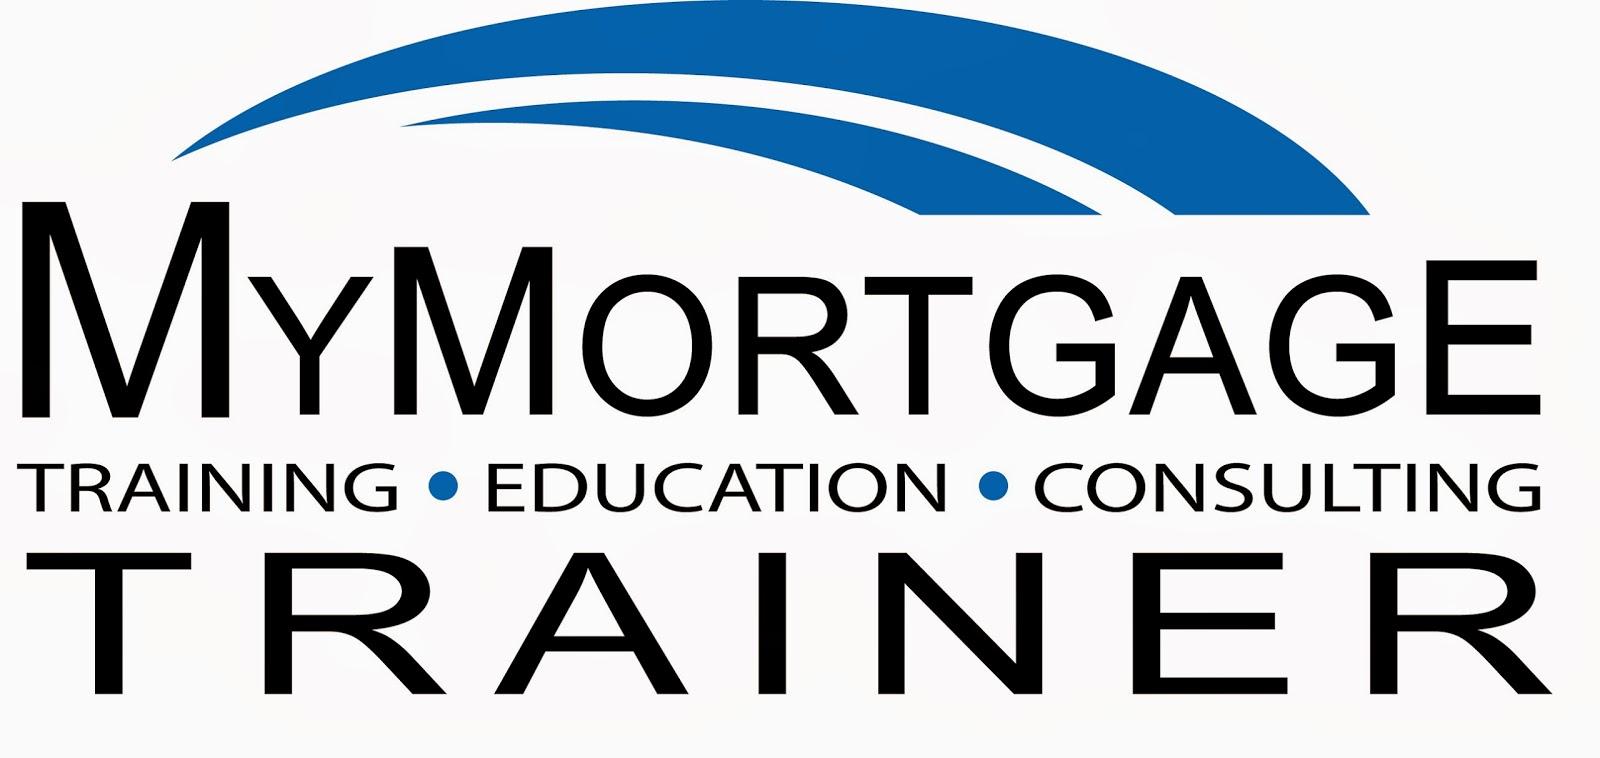 www.mymortgagetrainer.com